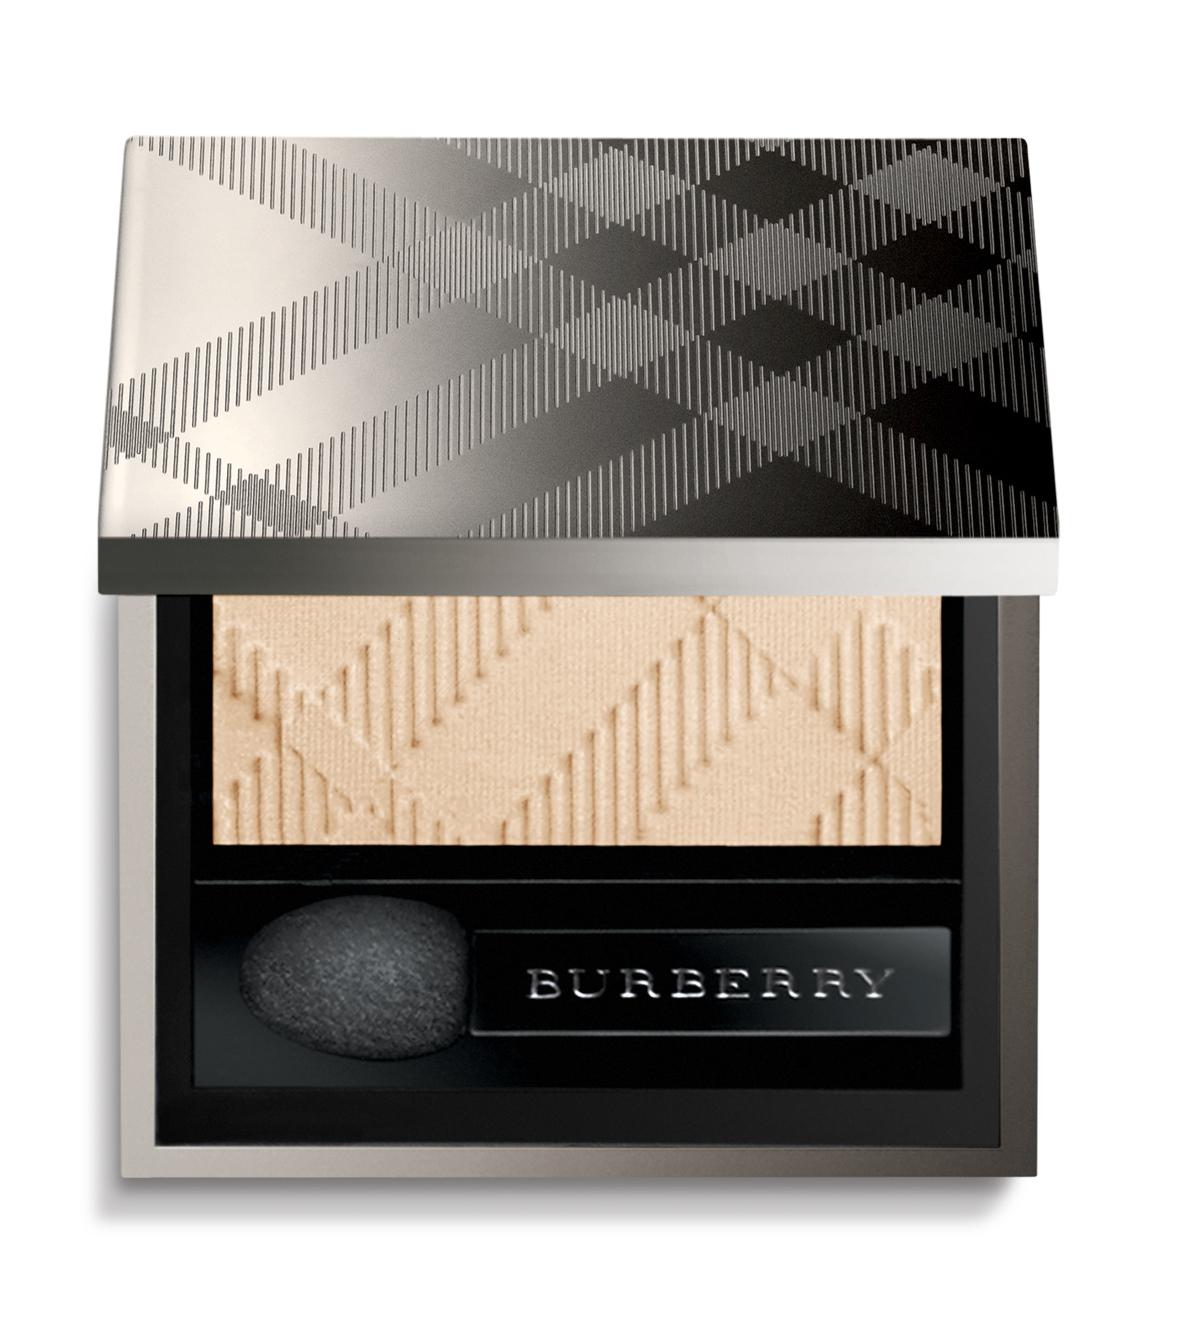 Burberry Sheer eye shadow Gold Pearl No.26